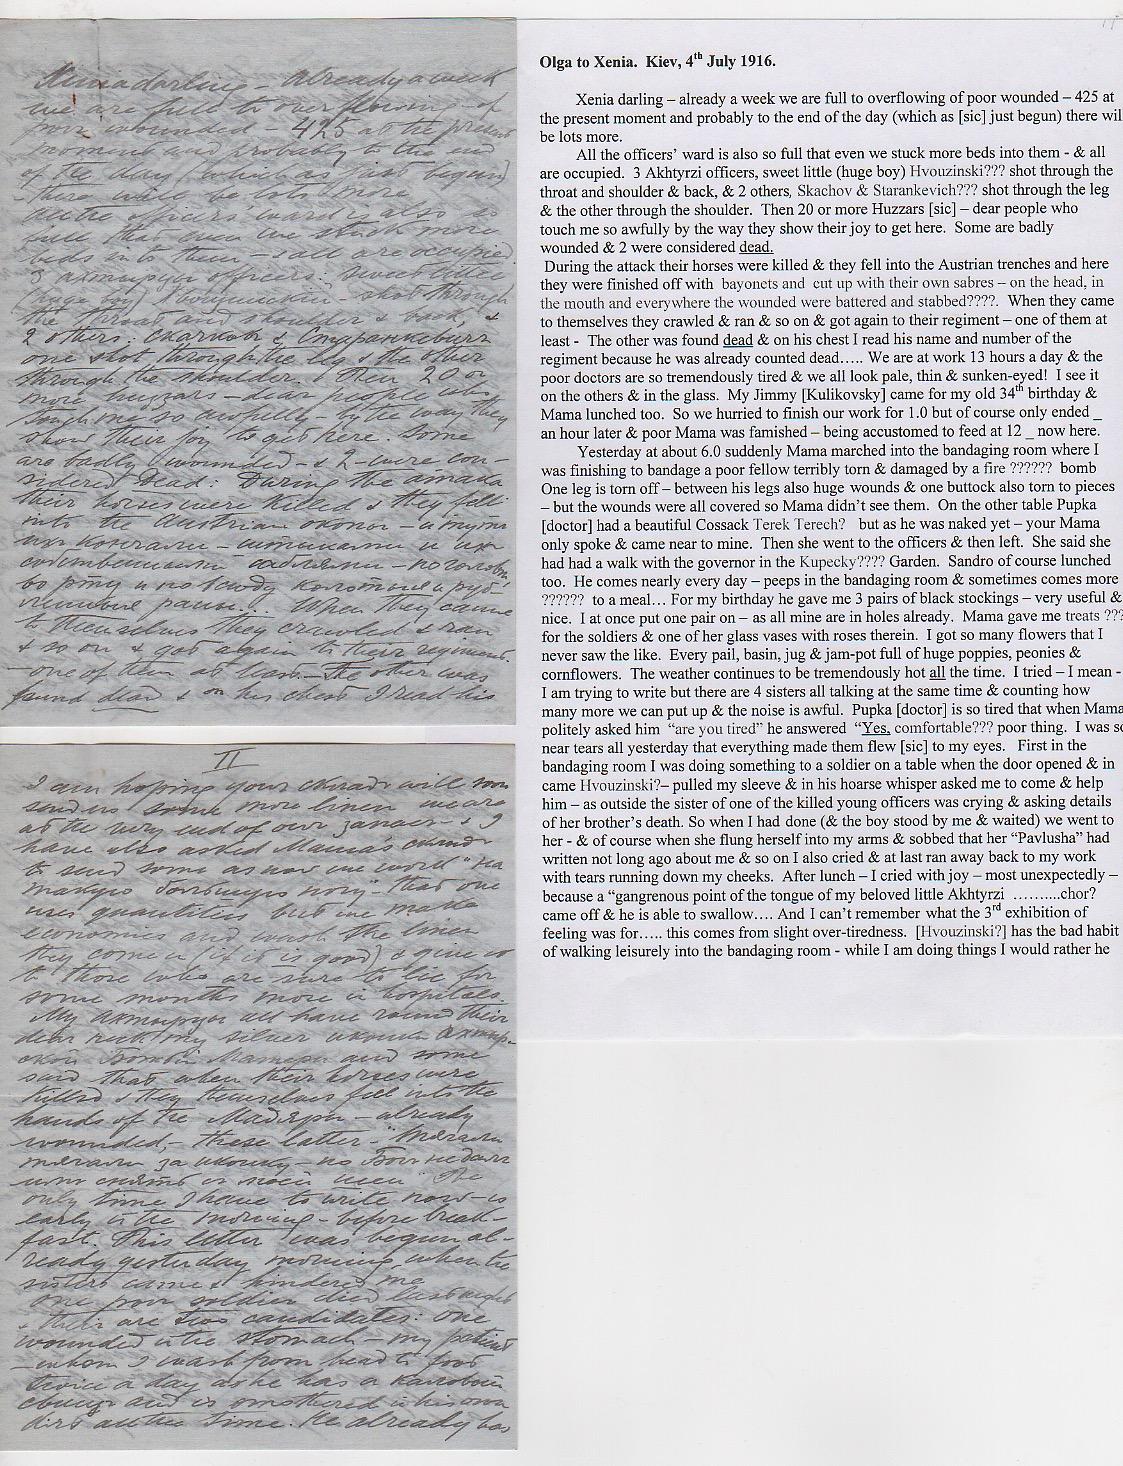 Royalty Grand Duchess Olga Correspondence To Her Sister Grand Duchess Xenia 1916-1920 - Image 33 of 47